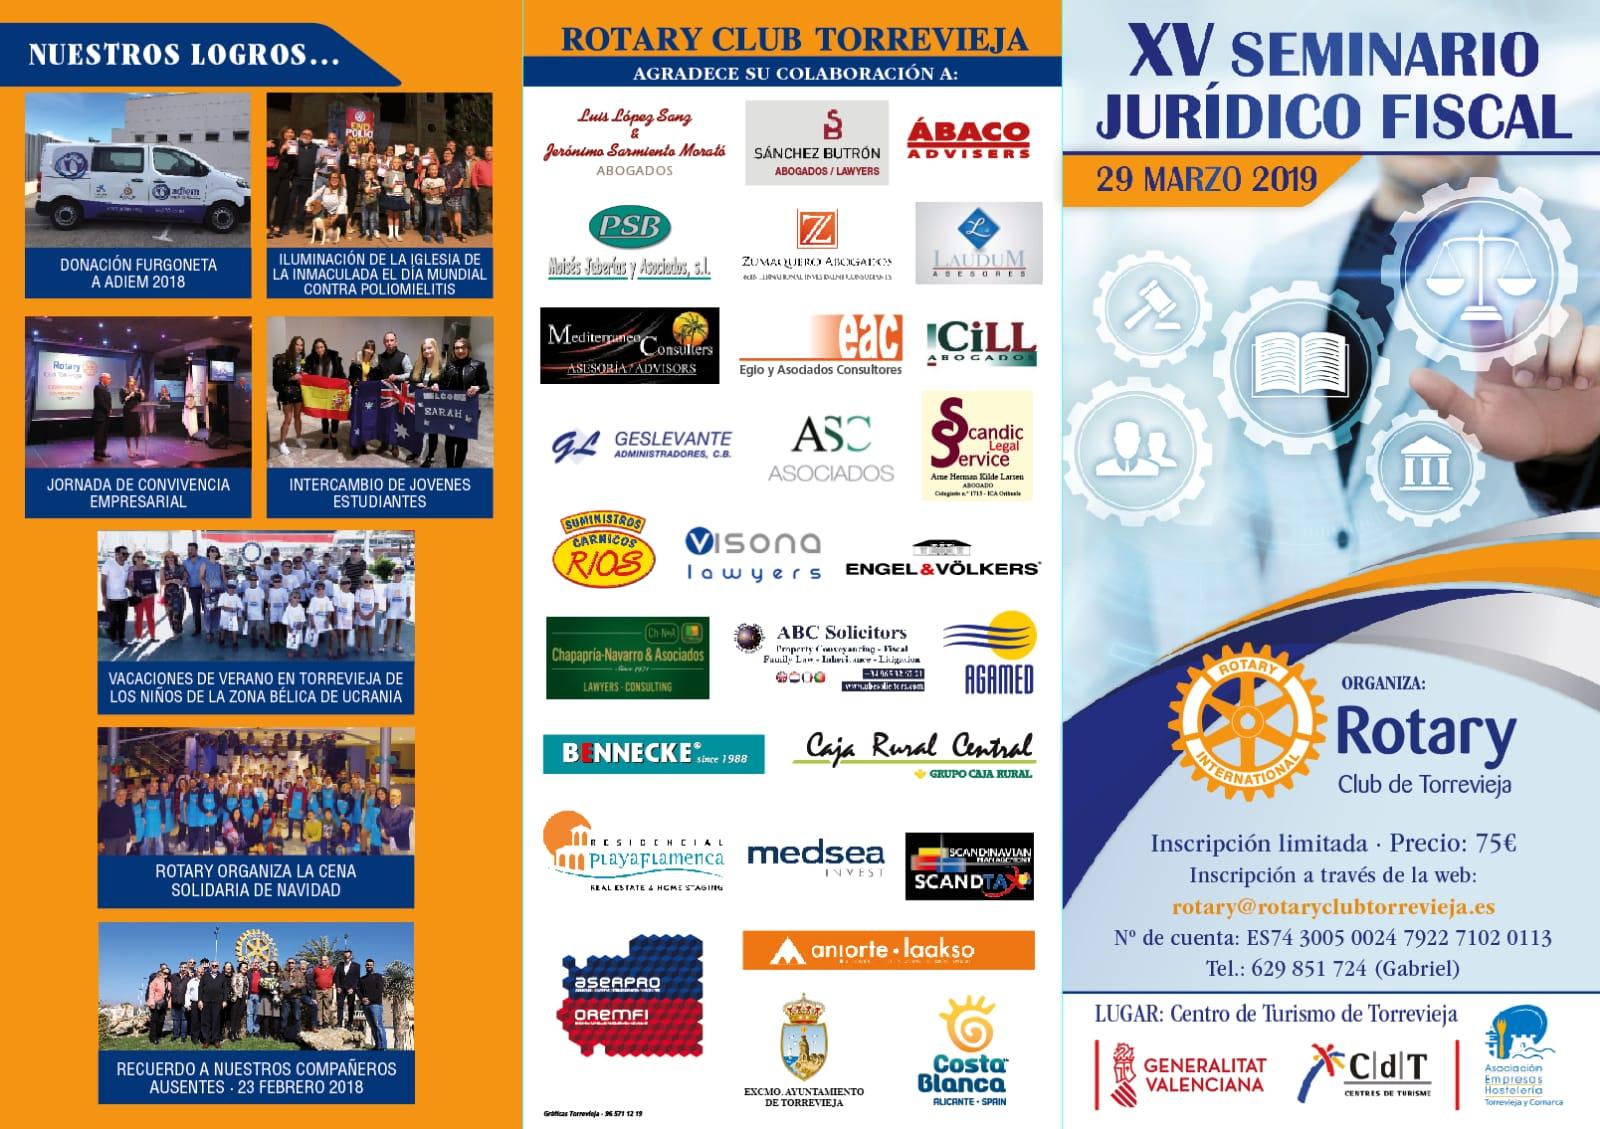 Rotary Club: Seminario Juridico Fiscal